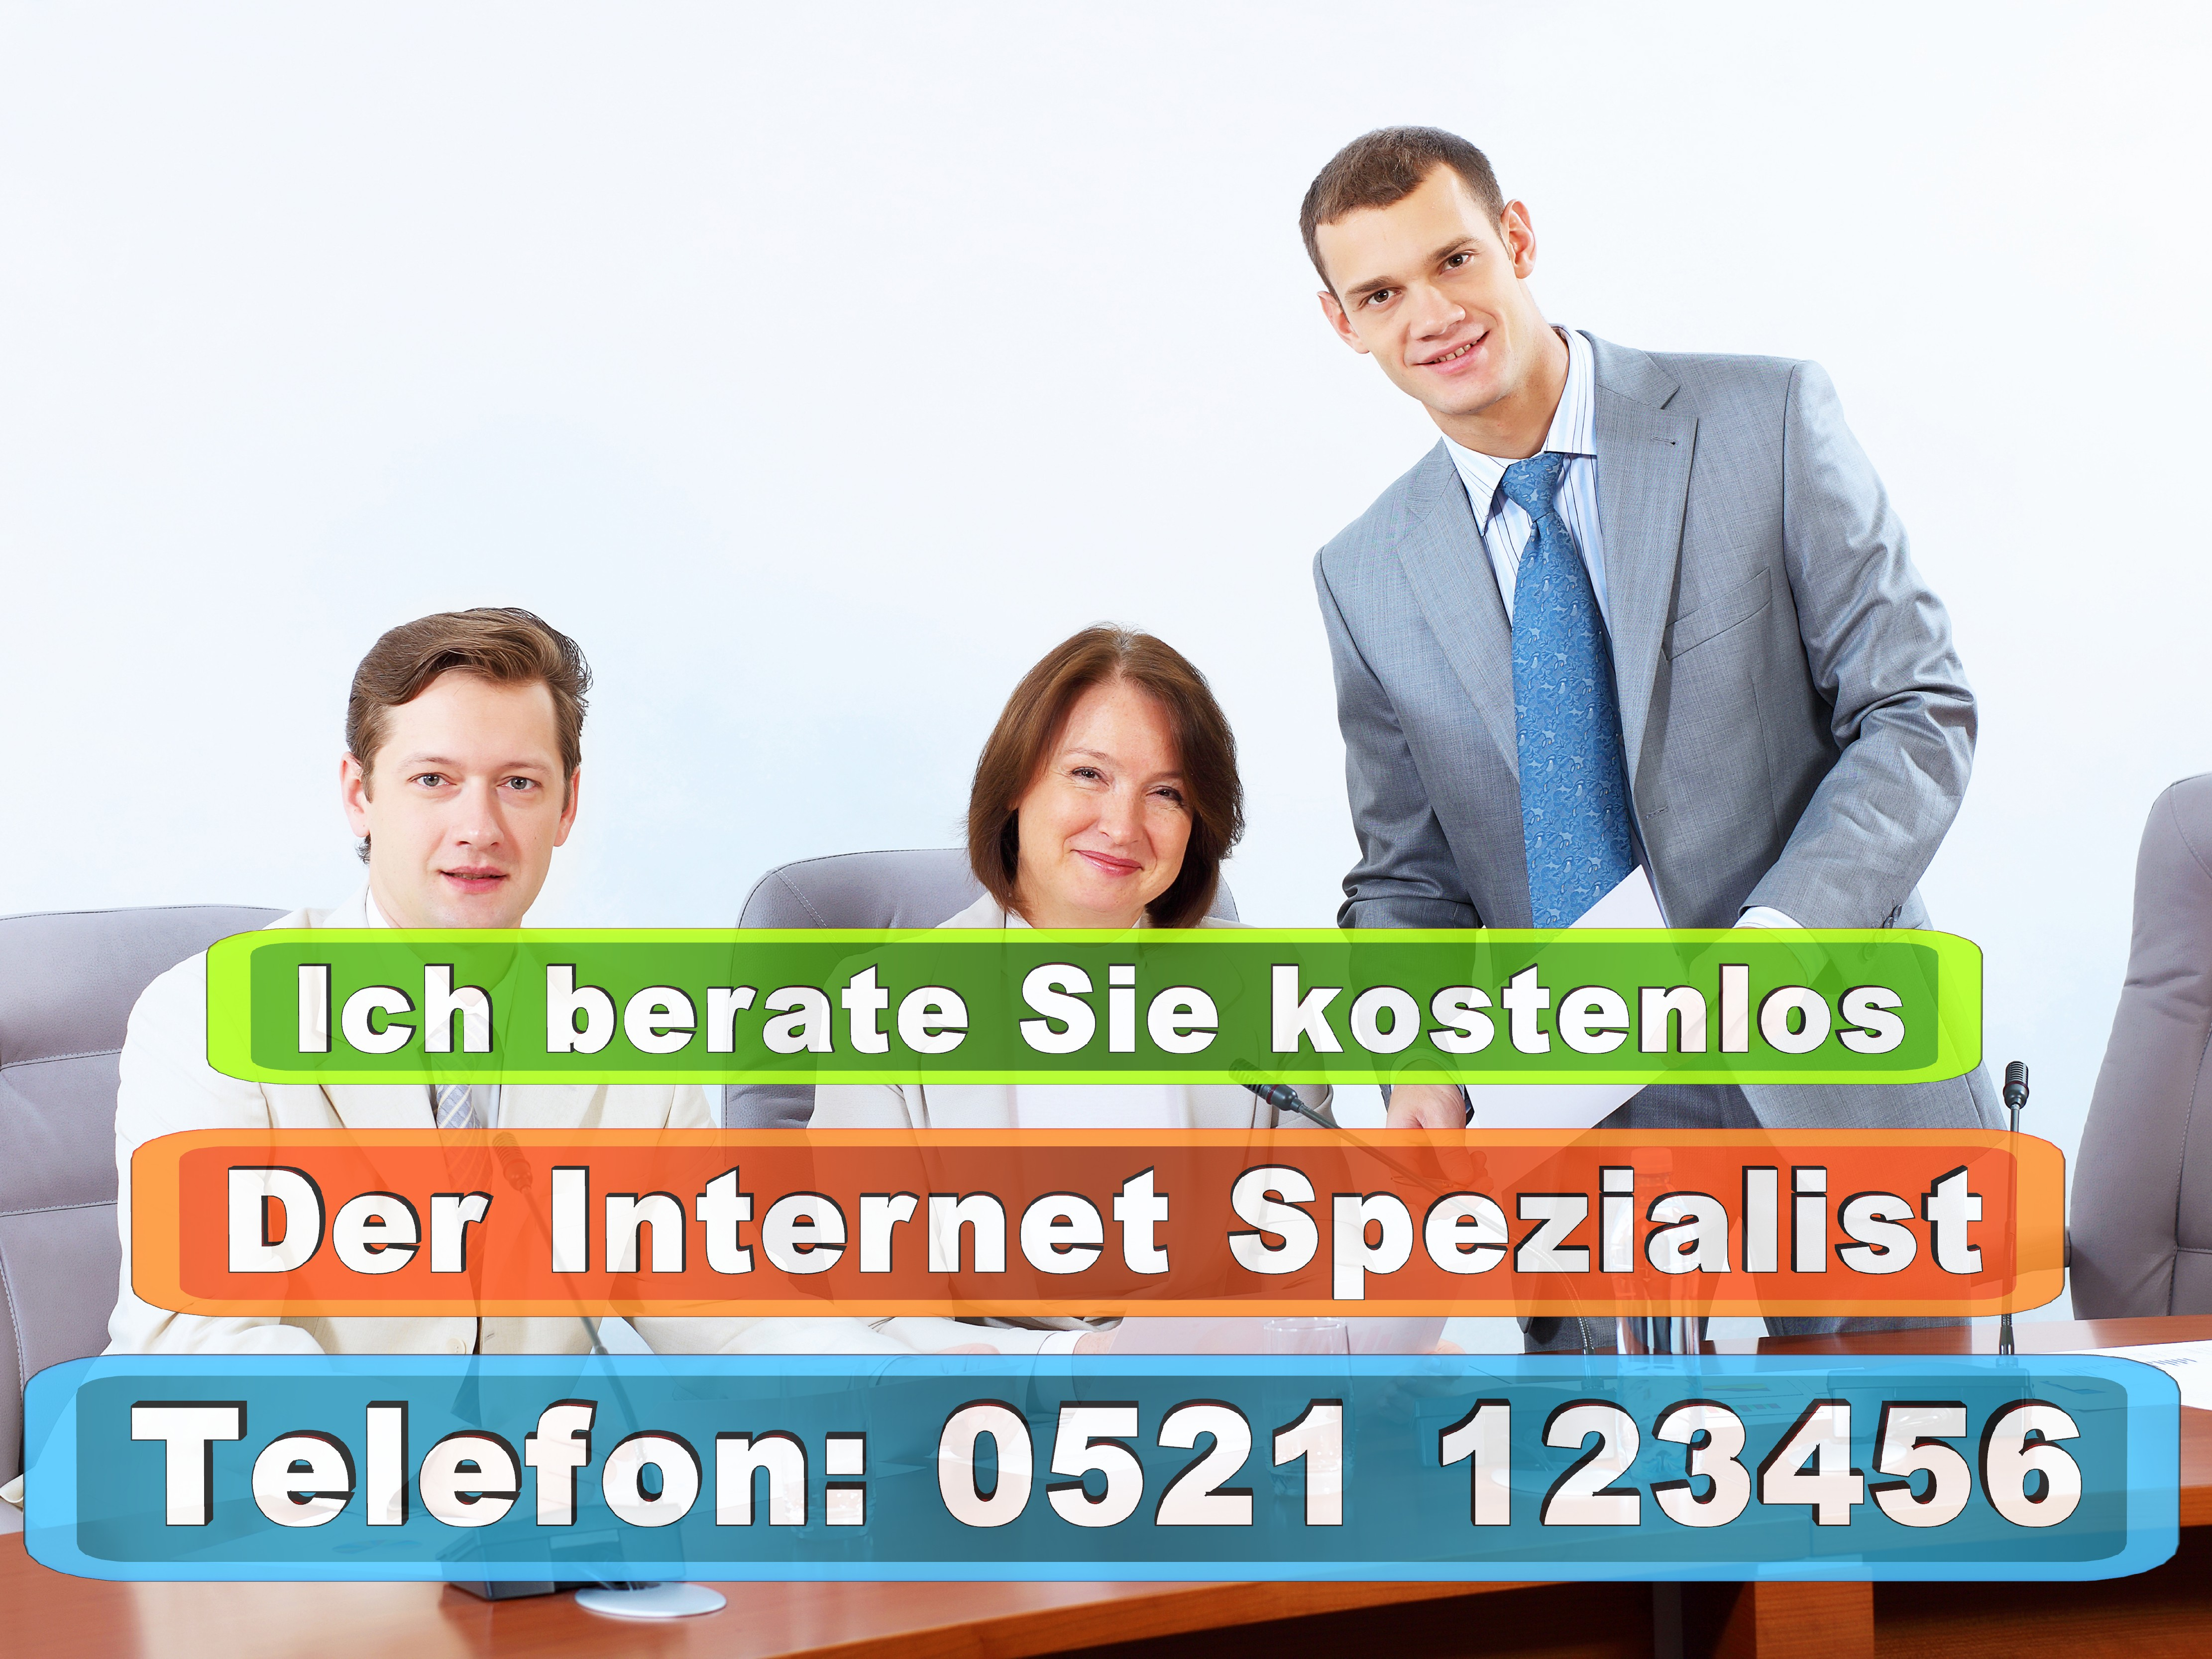 Rechtsanwalt In Bielefeld Steuerberater NRW OWL Paderborn Münster Dortmund Berlin Hamburg Düsseldorf Köln (4)